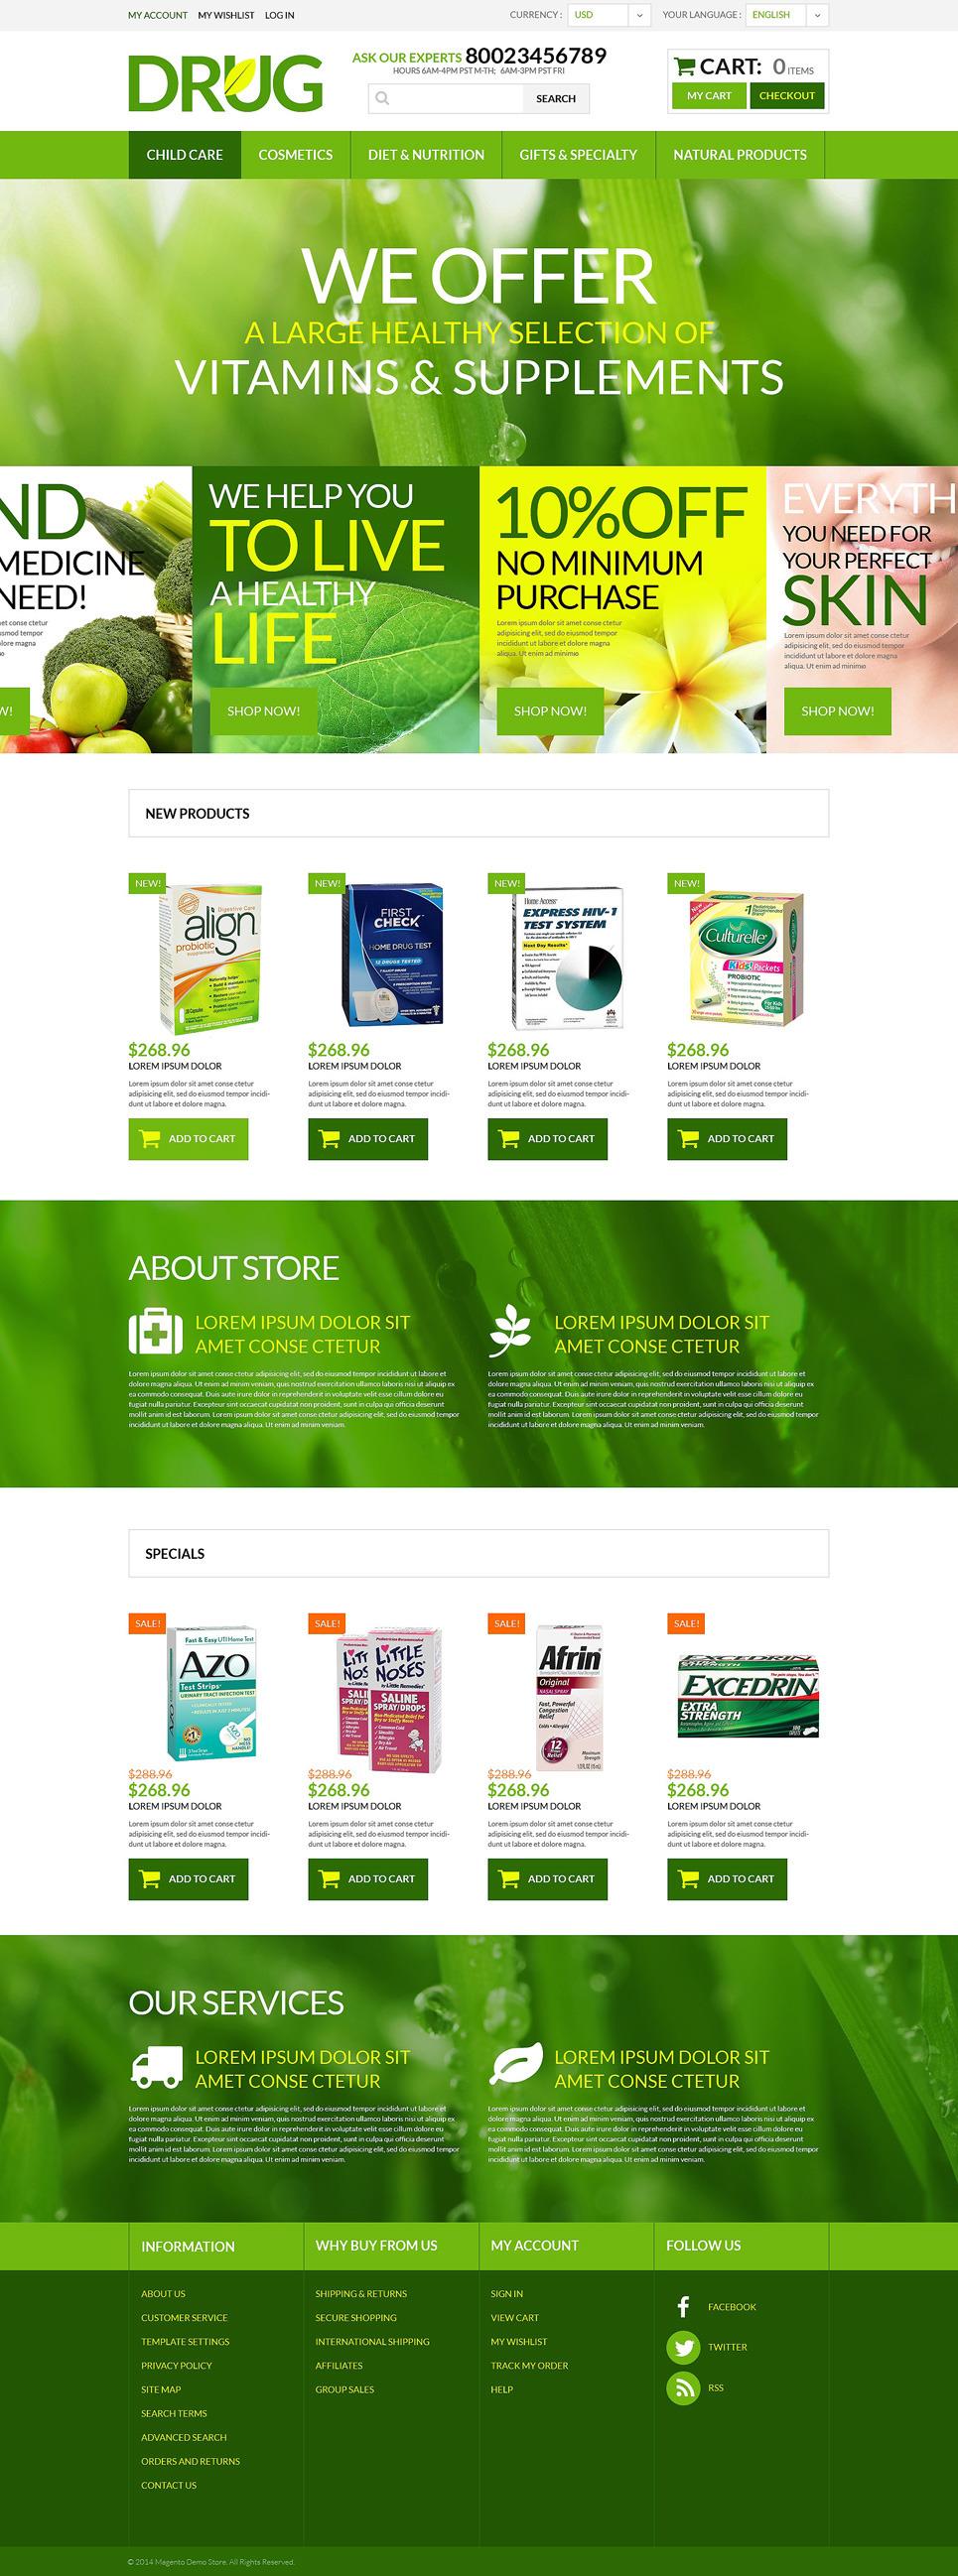 Drug Store PSD Template New Screenshots BIG